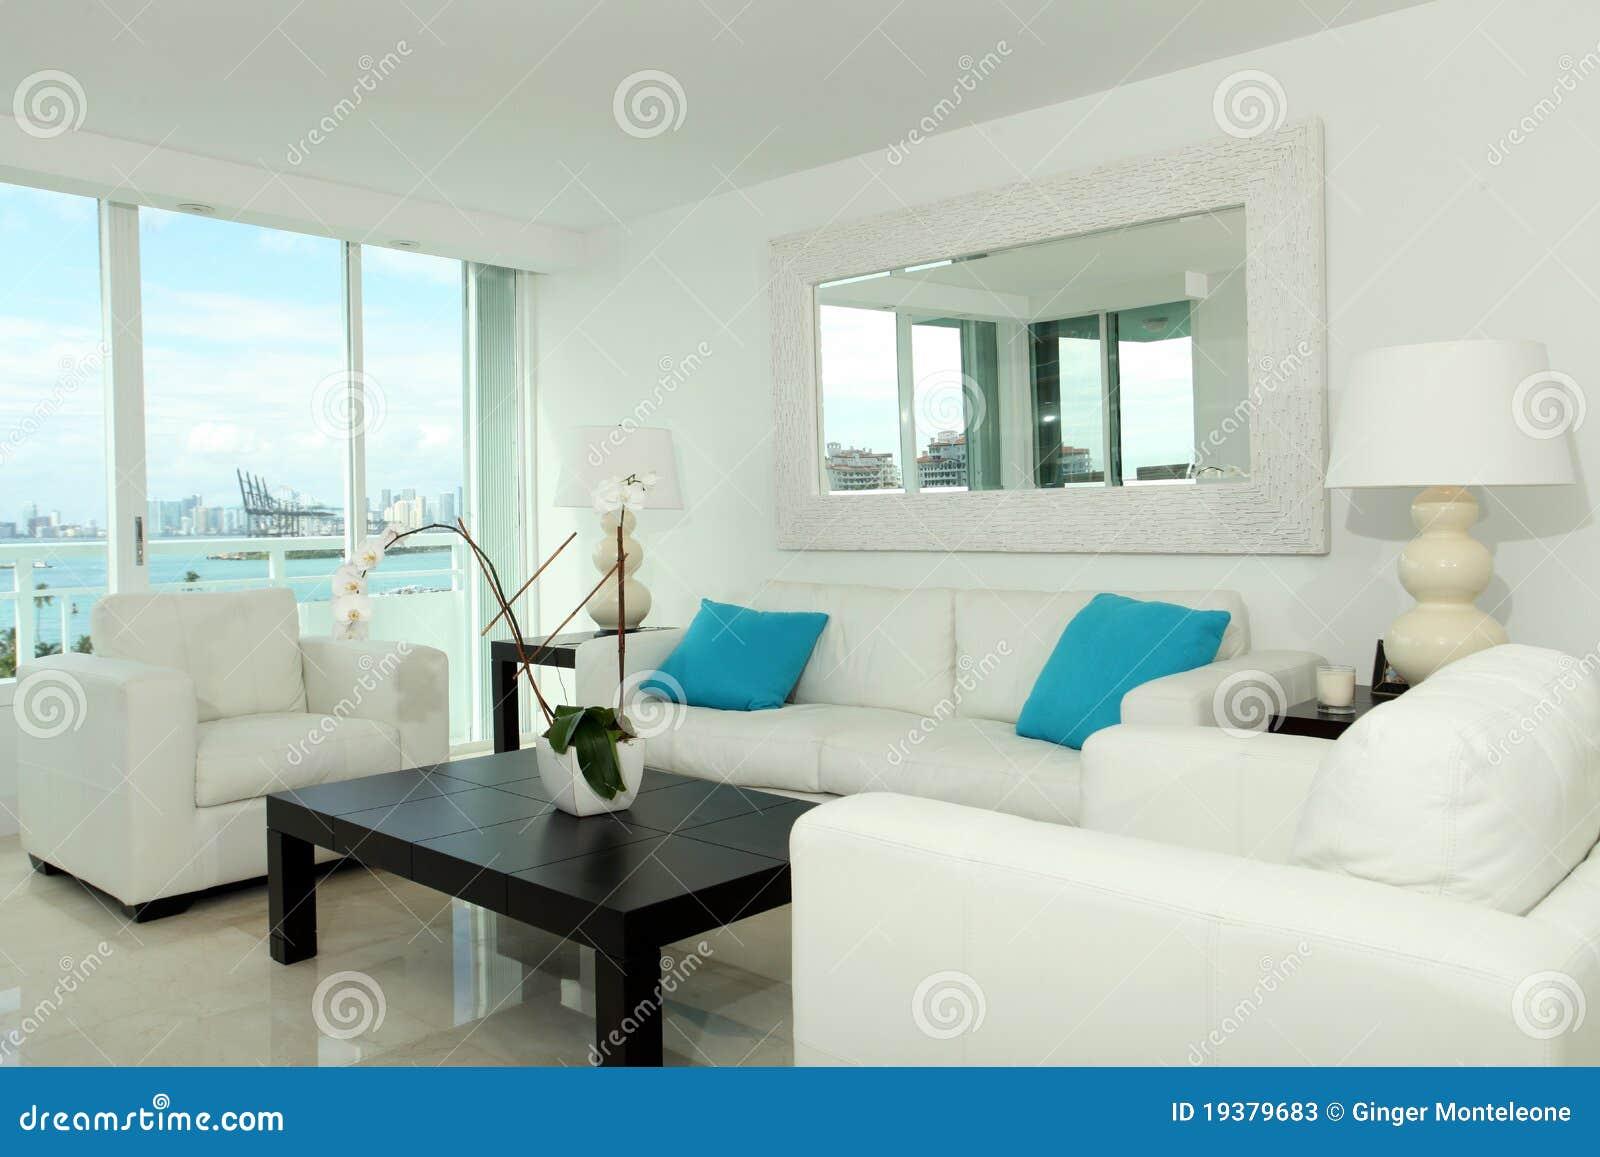 South Beach Living Room Stock Photos